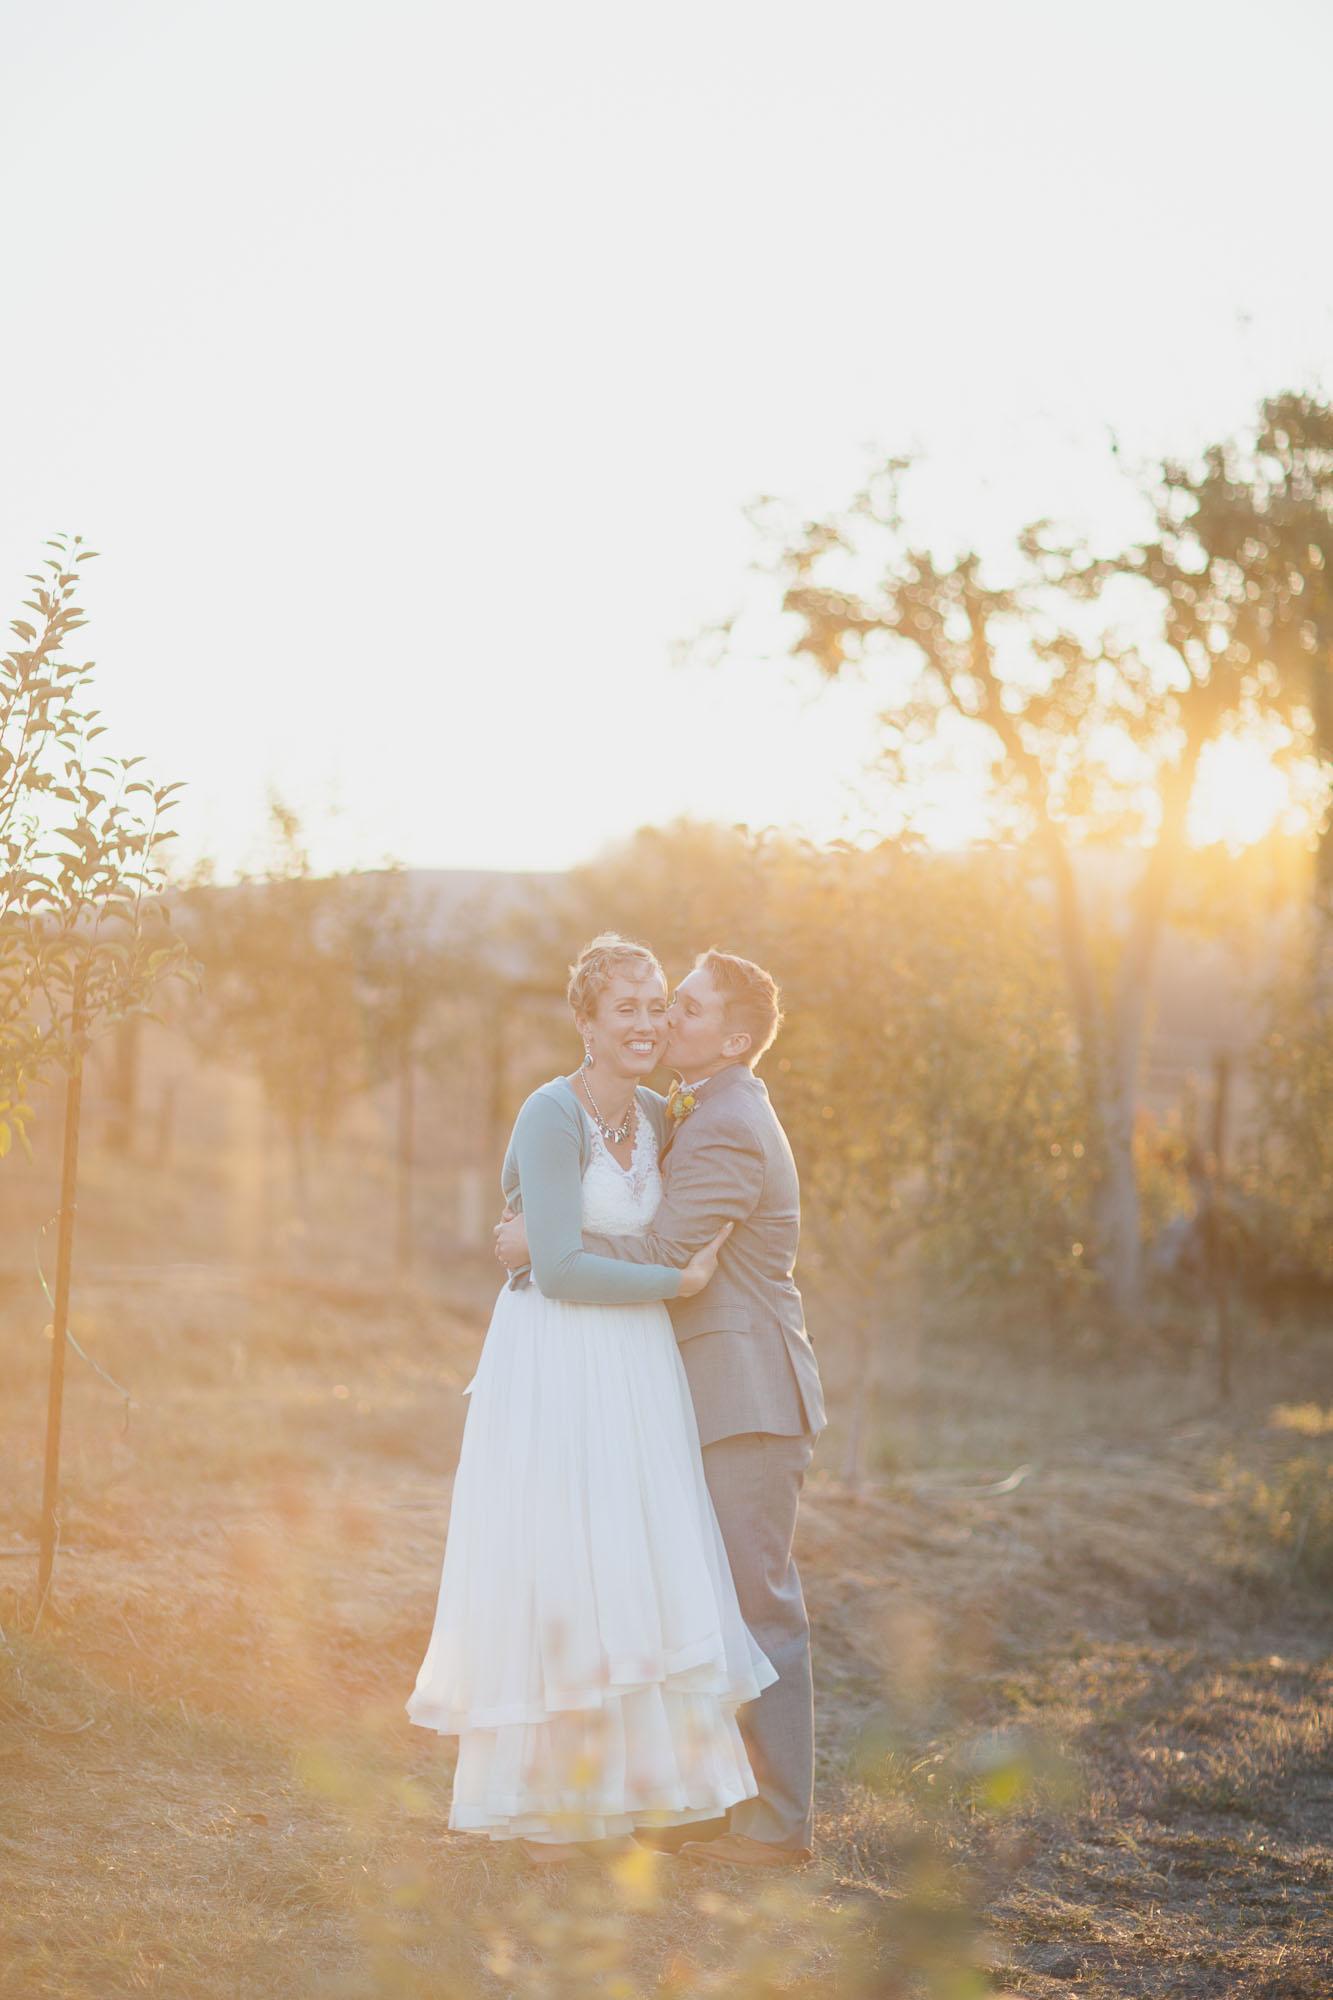 Gretchen_Gause_Petaluma_Olympias_Valley_Wedding_Photo-199.jpg